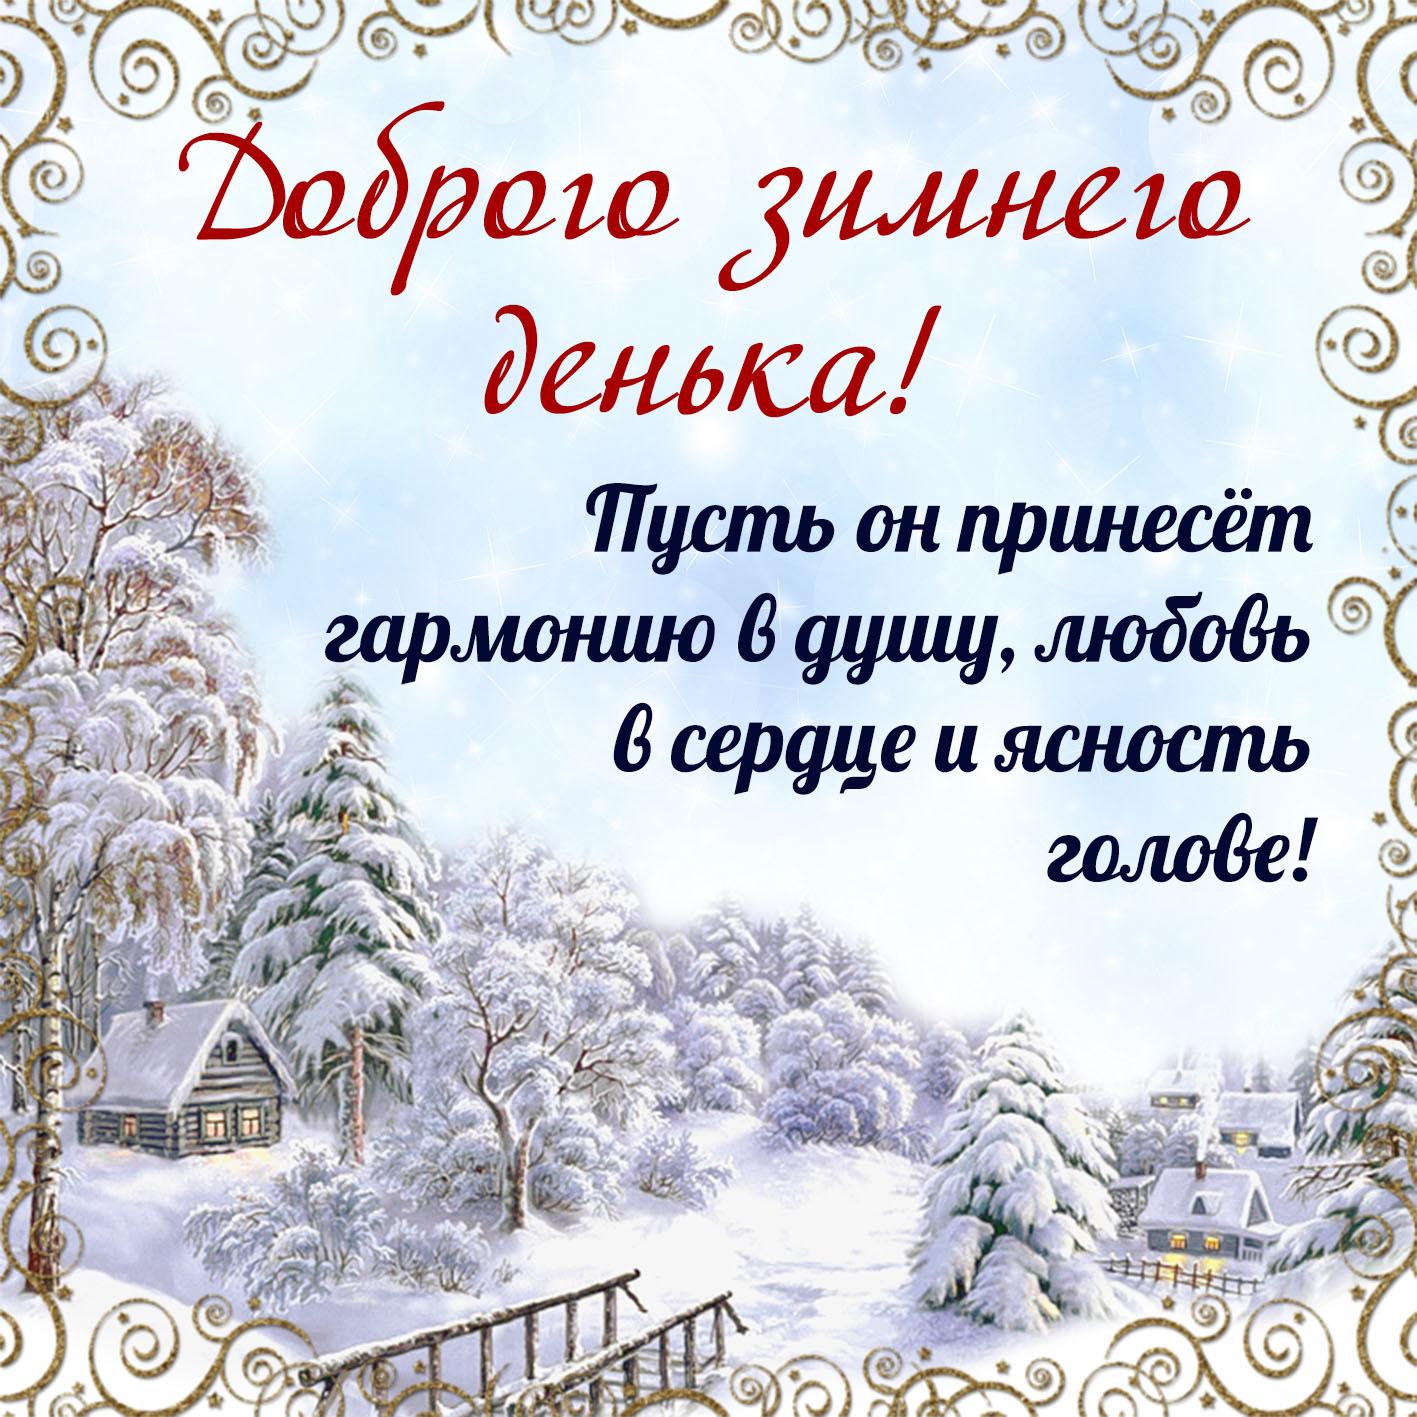 Зимние картинки со стихами доброго дня